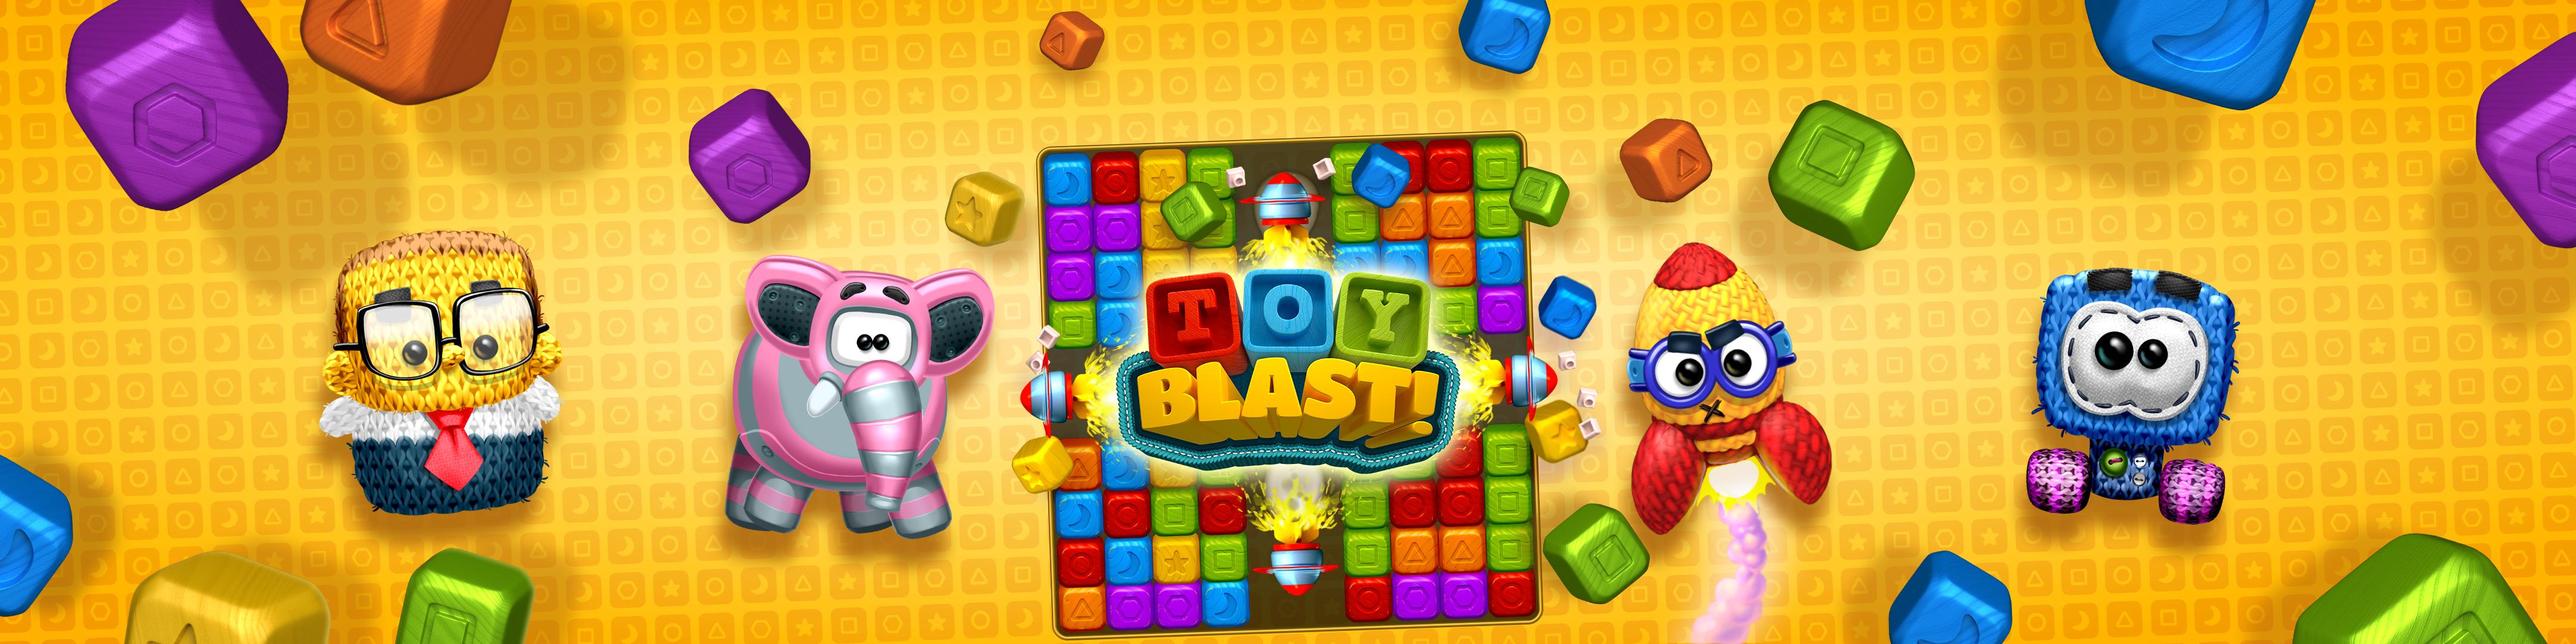 Toy Blast - Revenue & Download estimates - Apple App Store - US